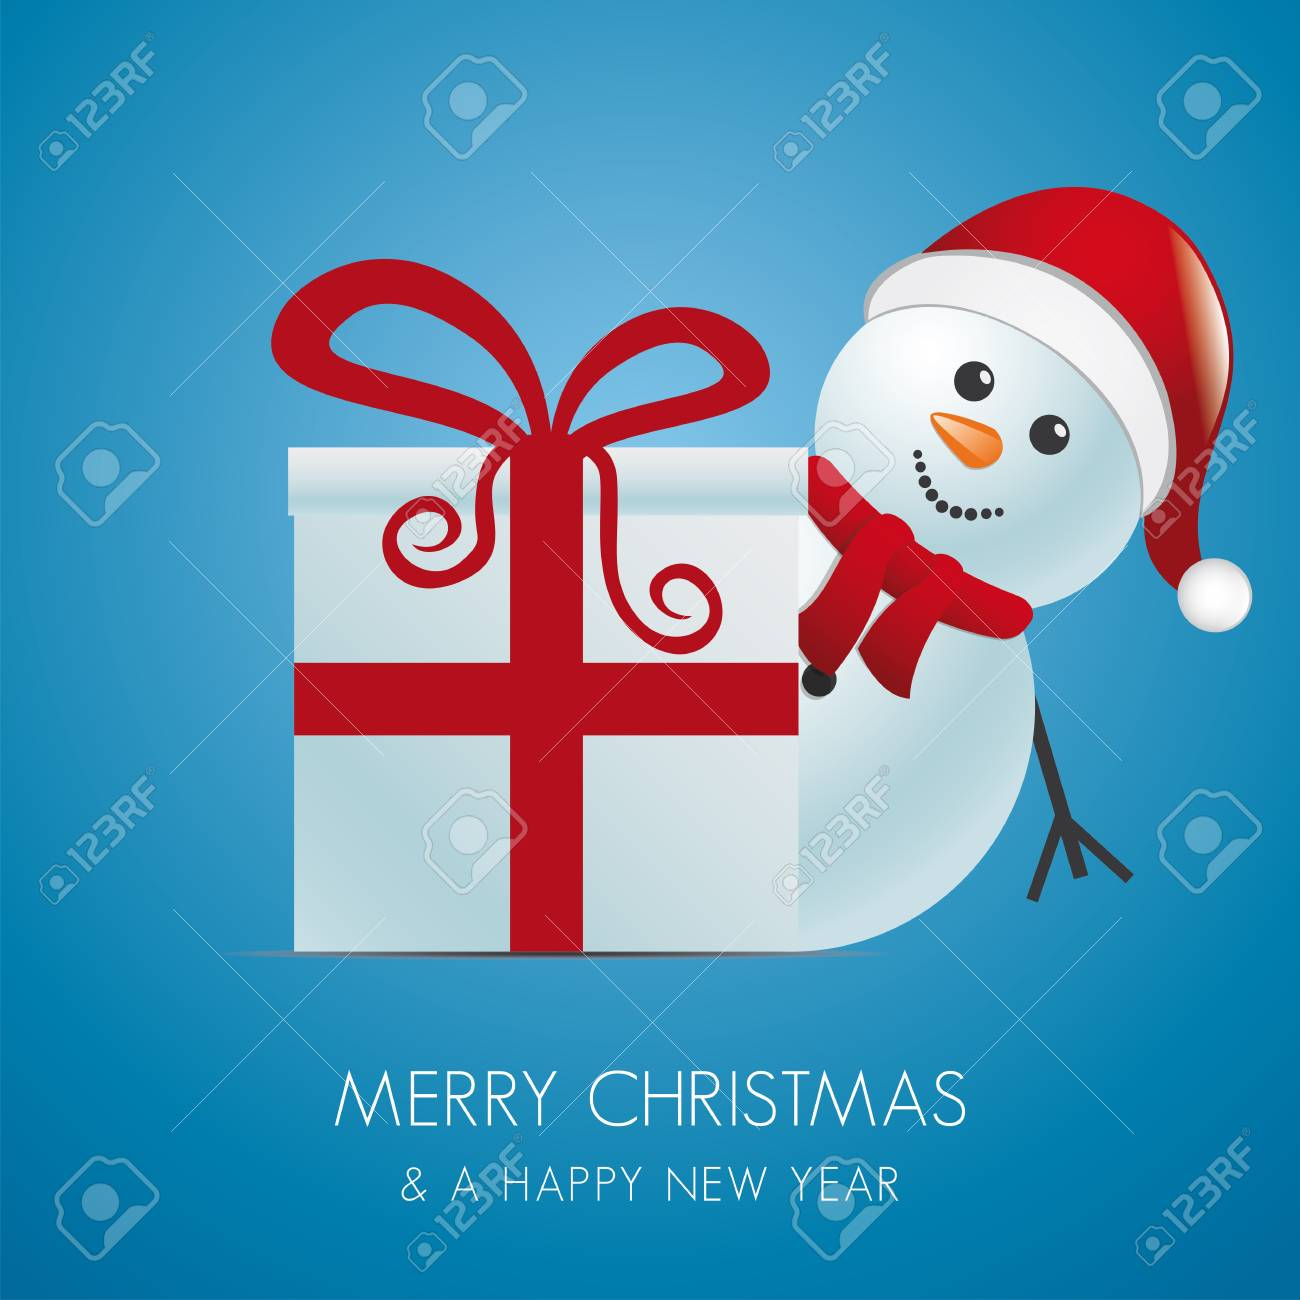 snowman with santa hat behind gift box Stock Vector - 15995026